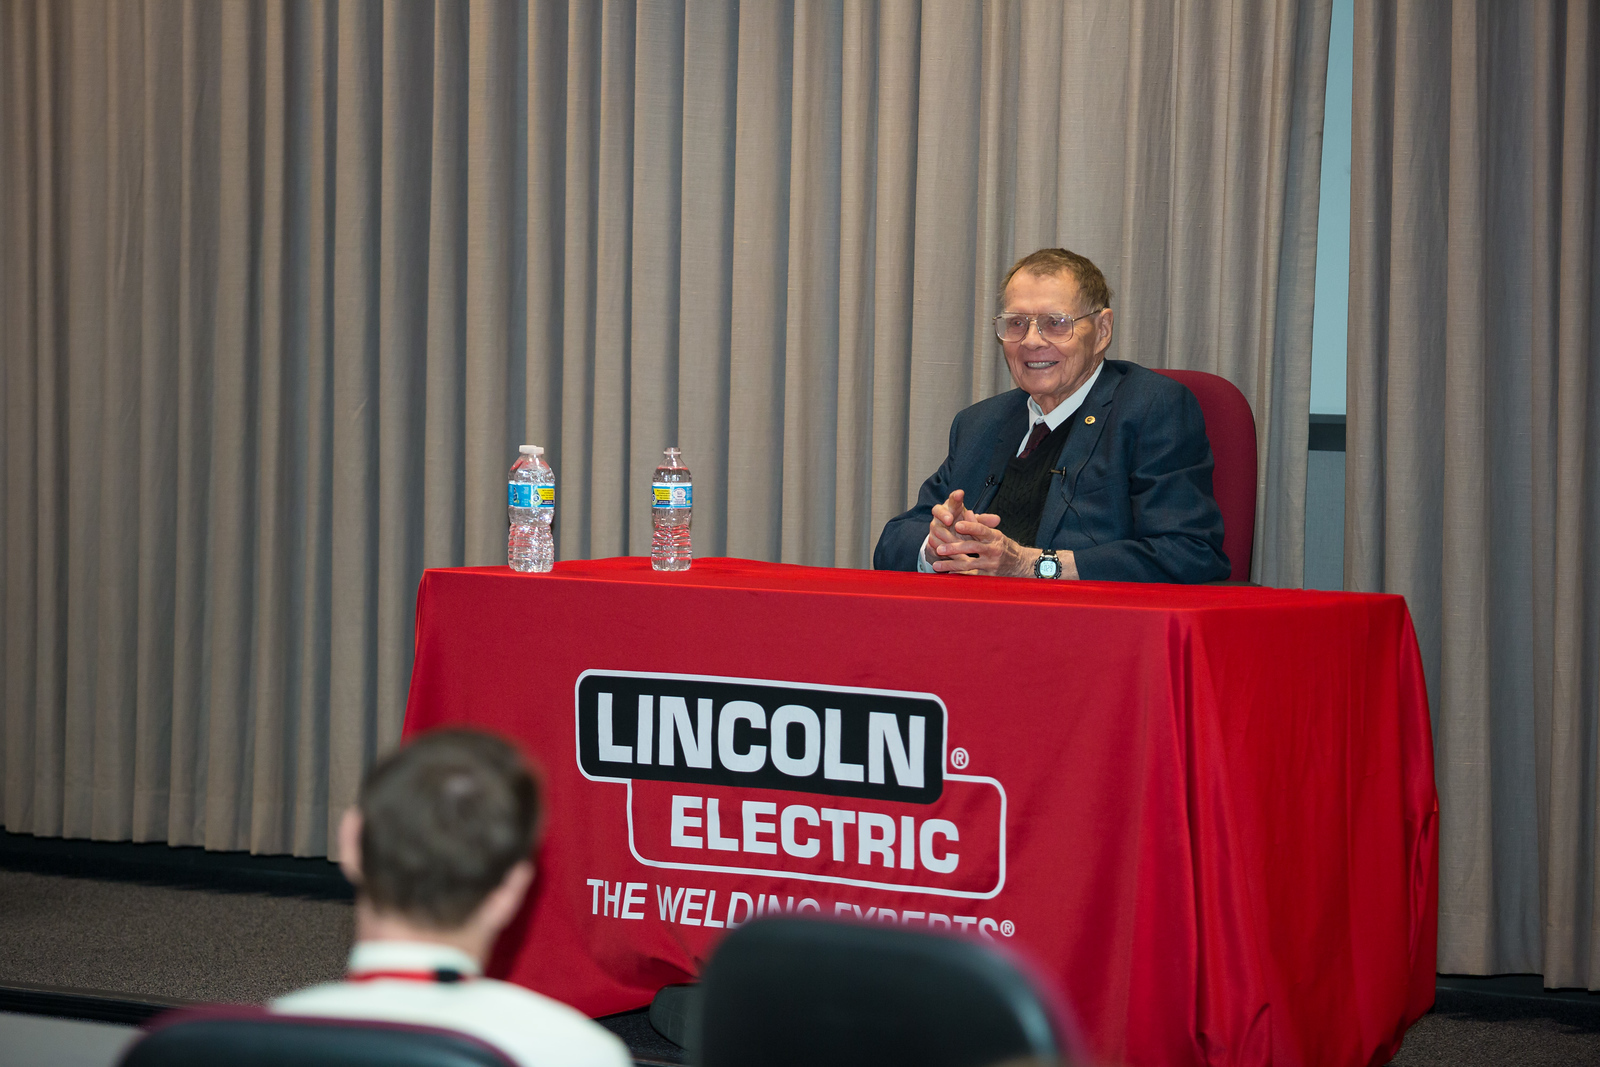 David C. Lincoln visit, April 19, 2017